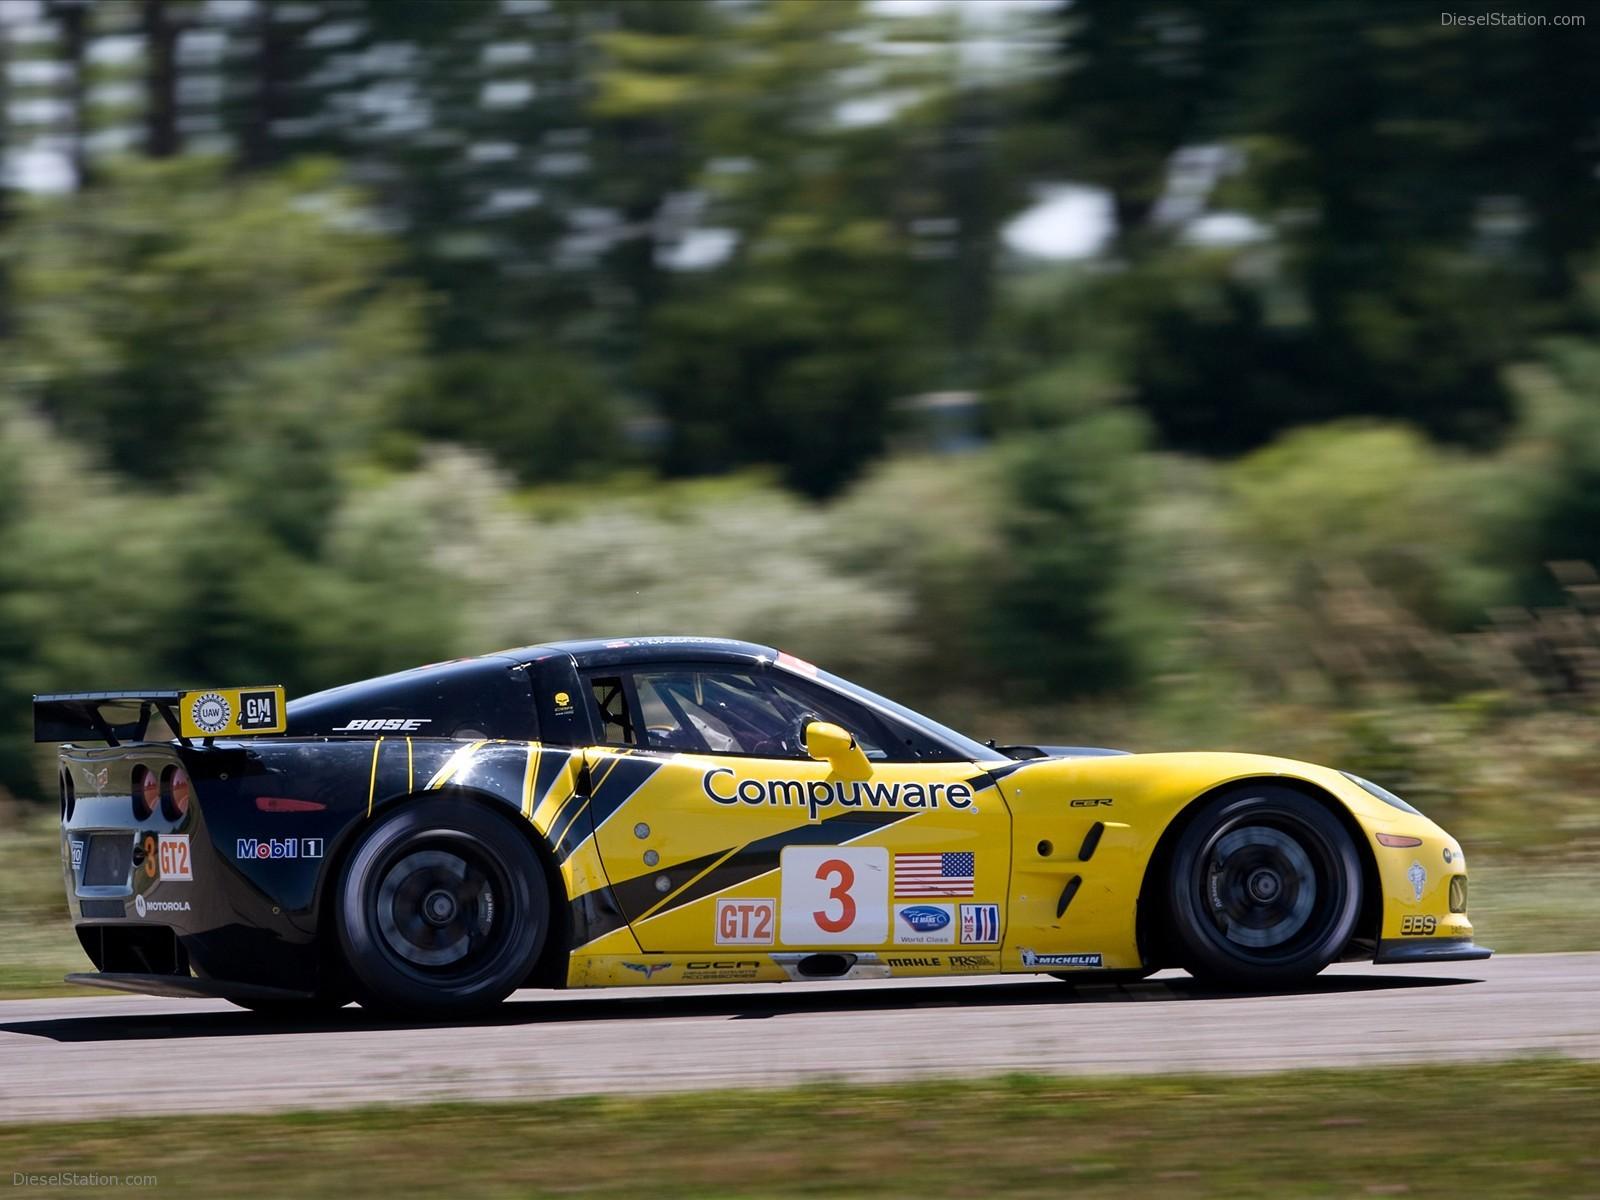 Corvette Racing Next Generation C6R Exotic Car Wallpapers 02 of 32 1600x1200